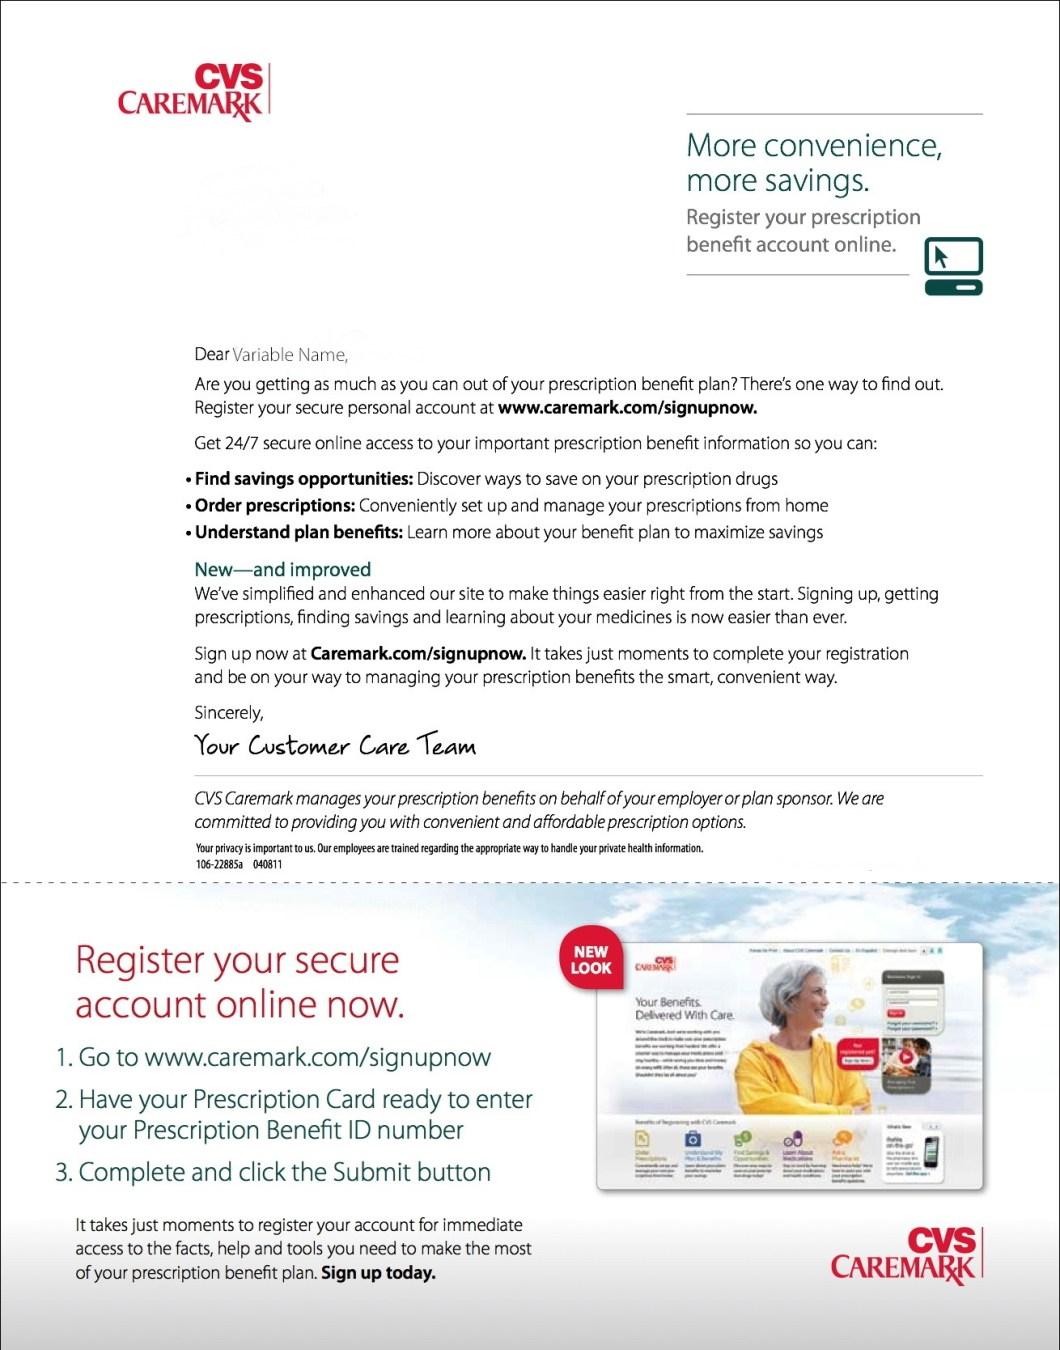 caremark prescription card walgreens letterjdi co - Walgreens Prescription Card